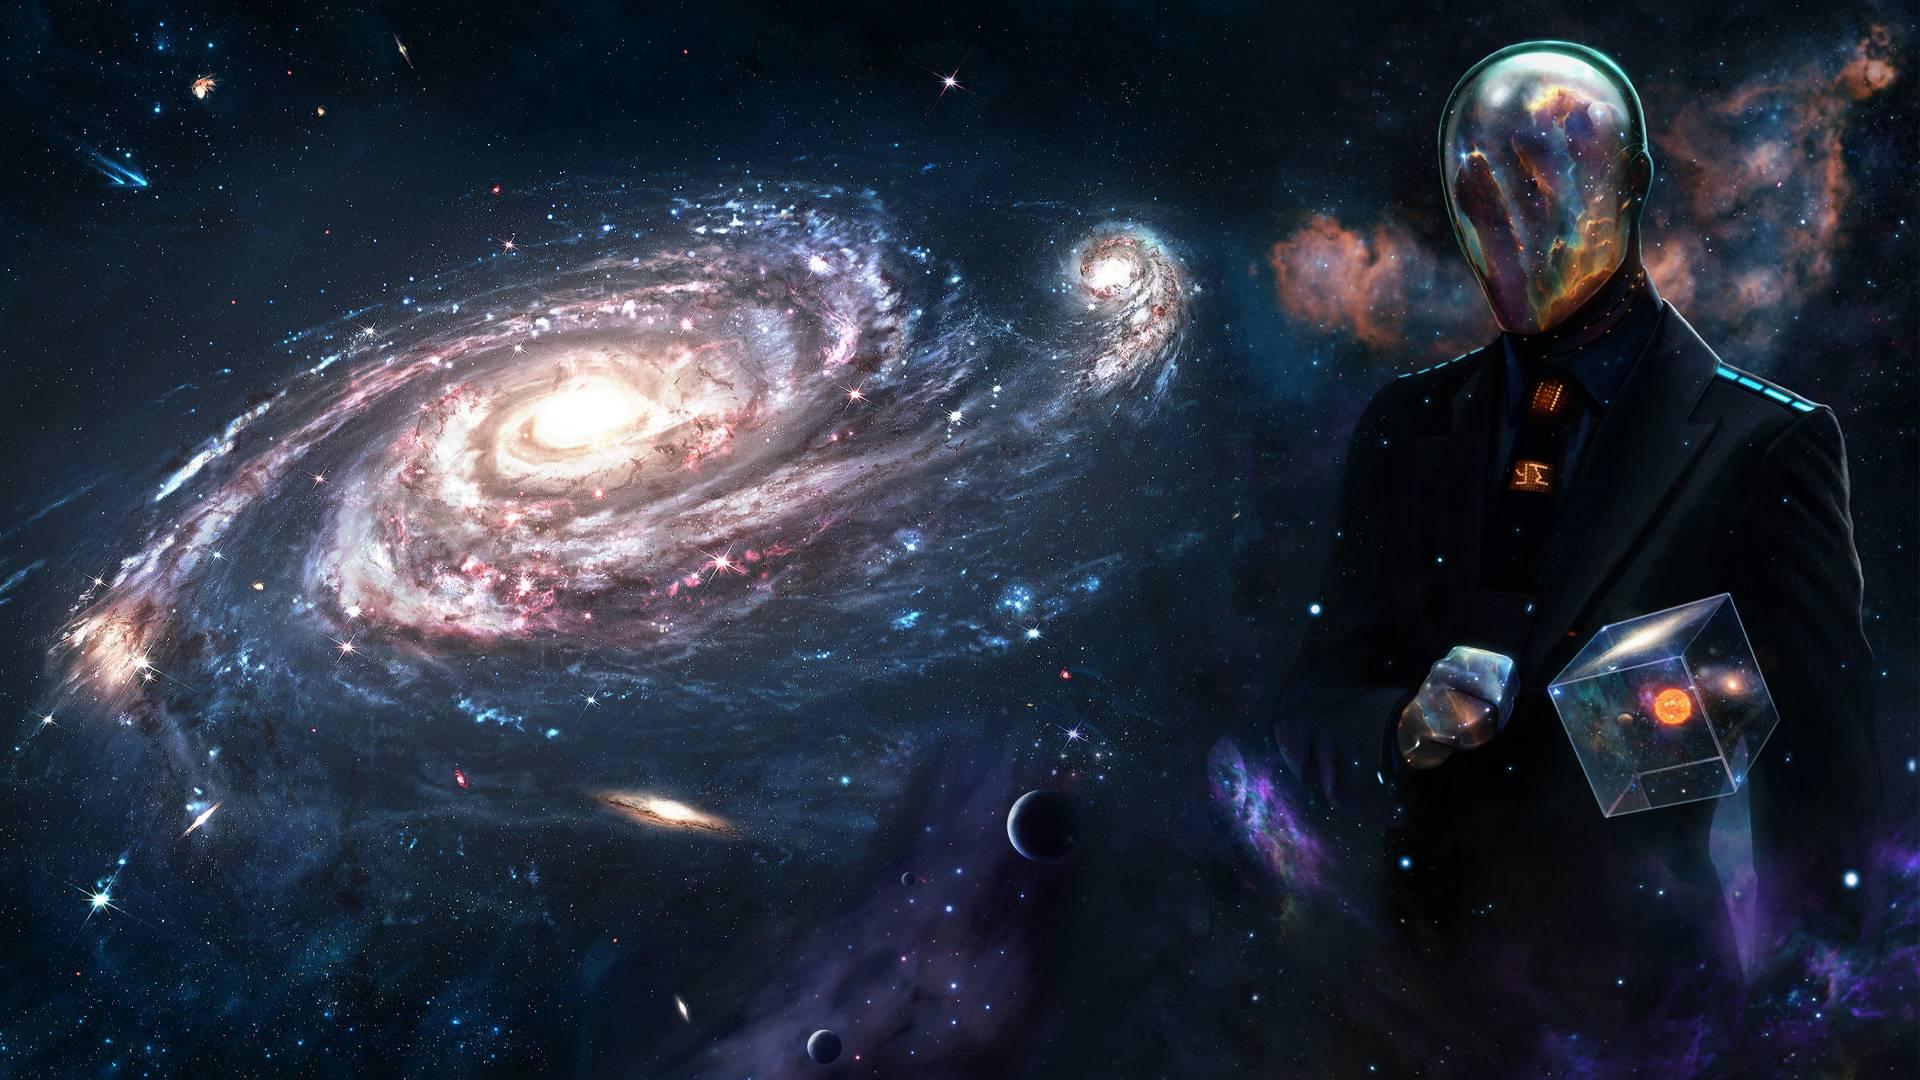 Wallpaper Space Galaxy Surreal 1920x1080 Kommandoh 1455269